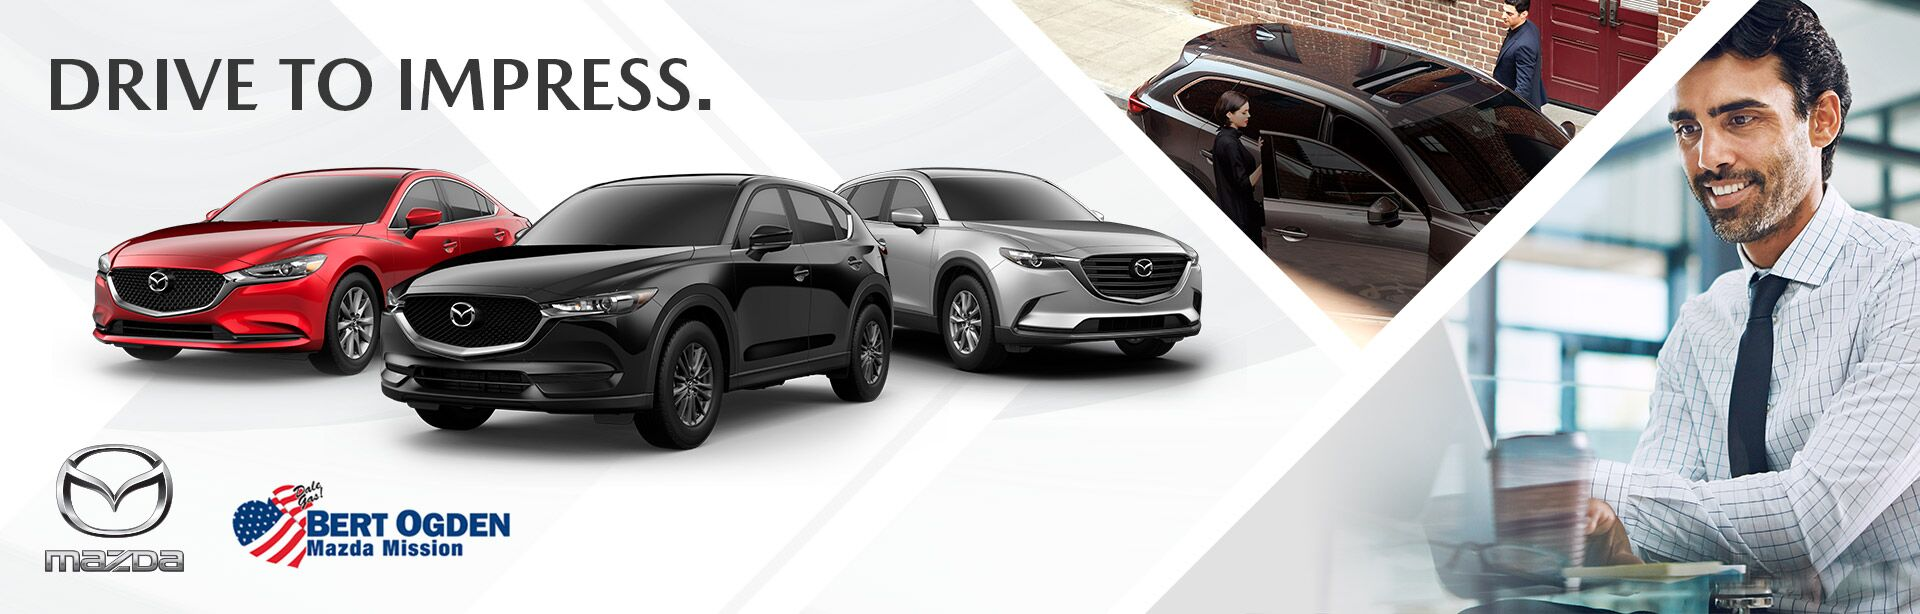 Mazda Models for Those Who Drive to Impress - Bert Ogden Mission Mazda - Mission, TX